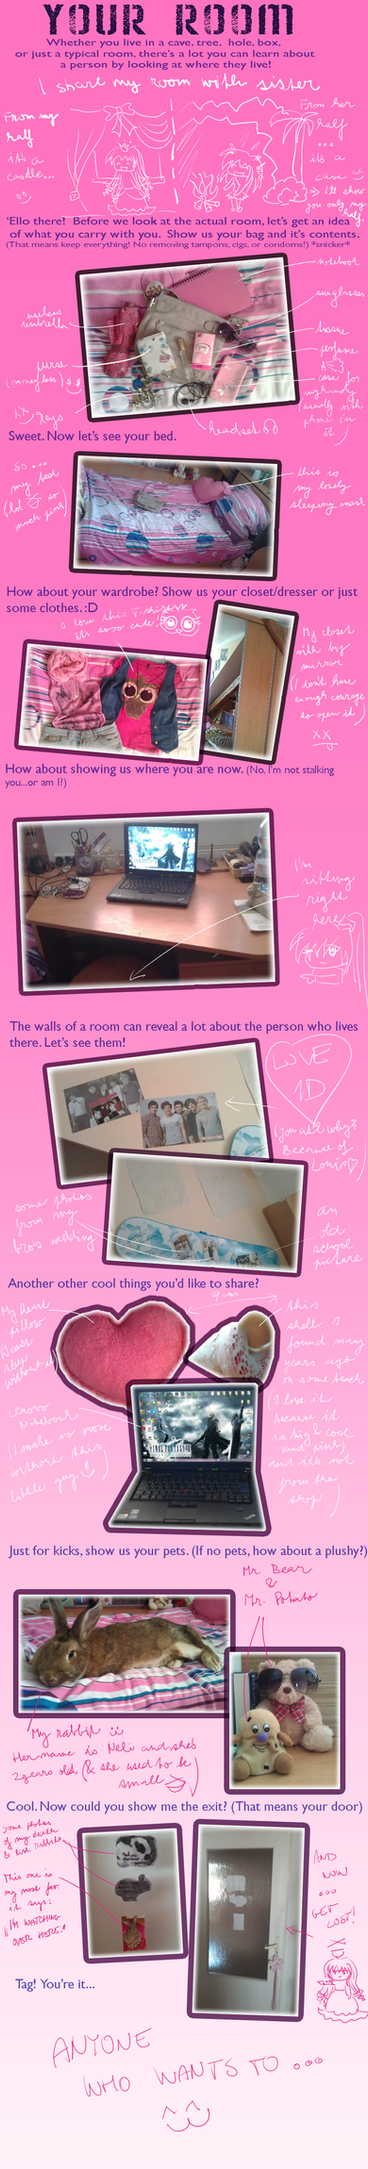 My Room Meme by magicalcolourofwinx